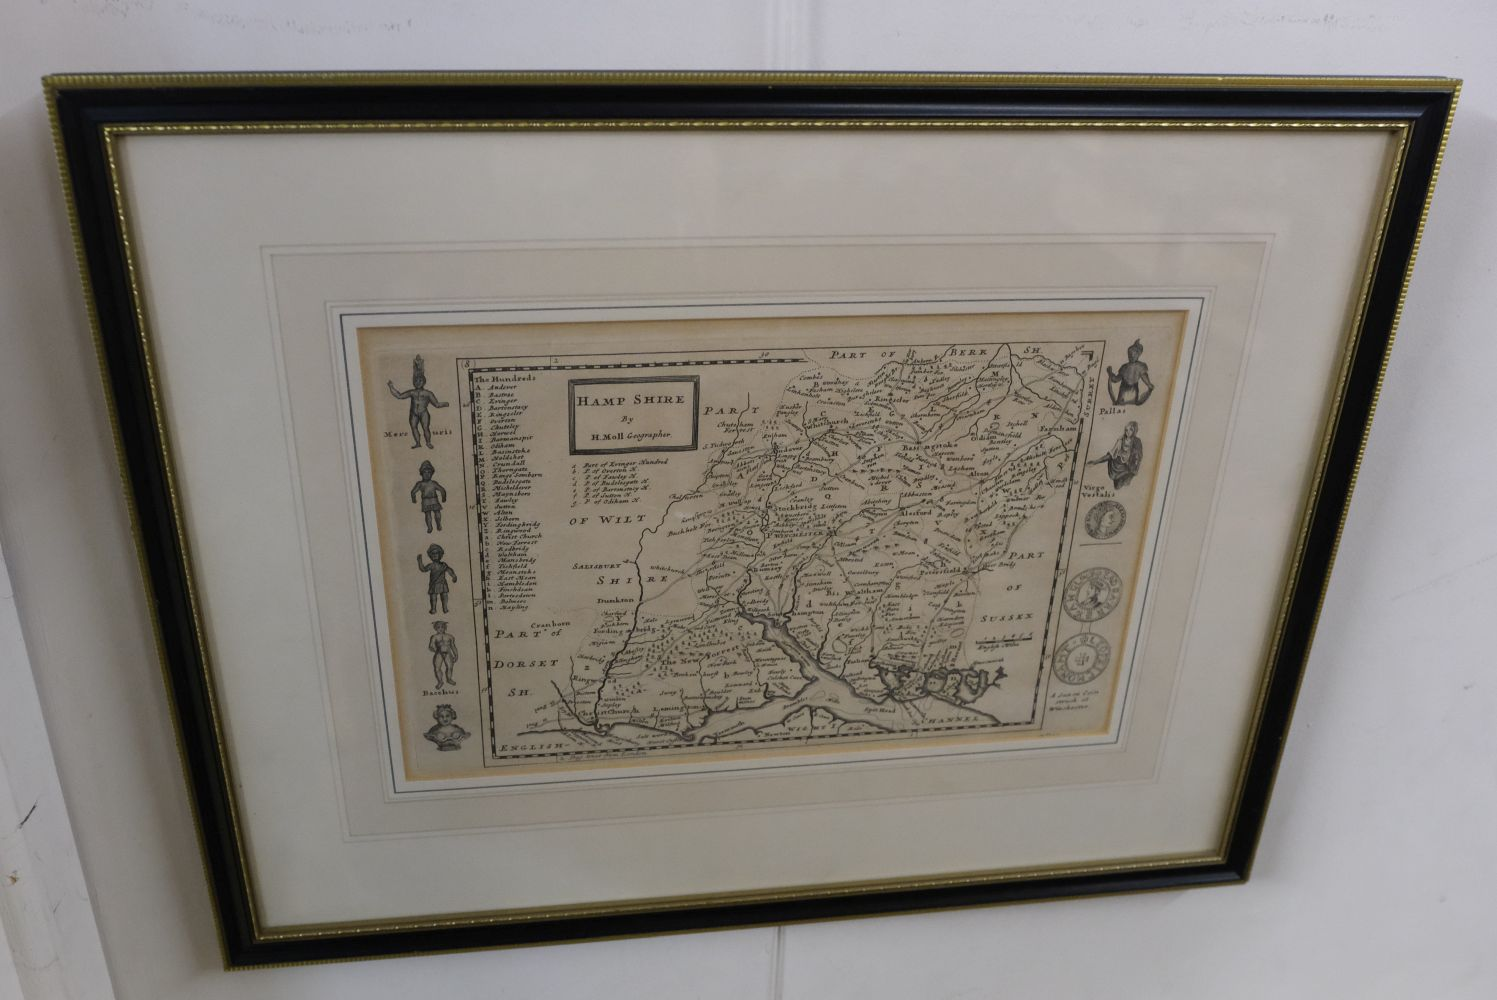 * Hampshire. Norden (J. & Hole G.), Hamshire olim pars Belgarum, circa 1637 - Image 4 of 7